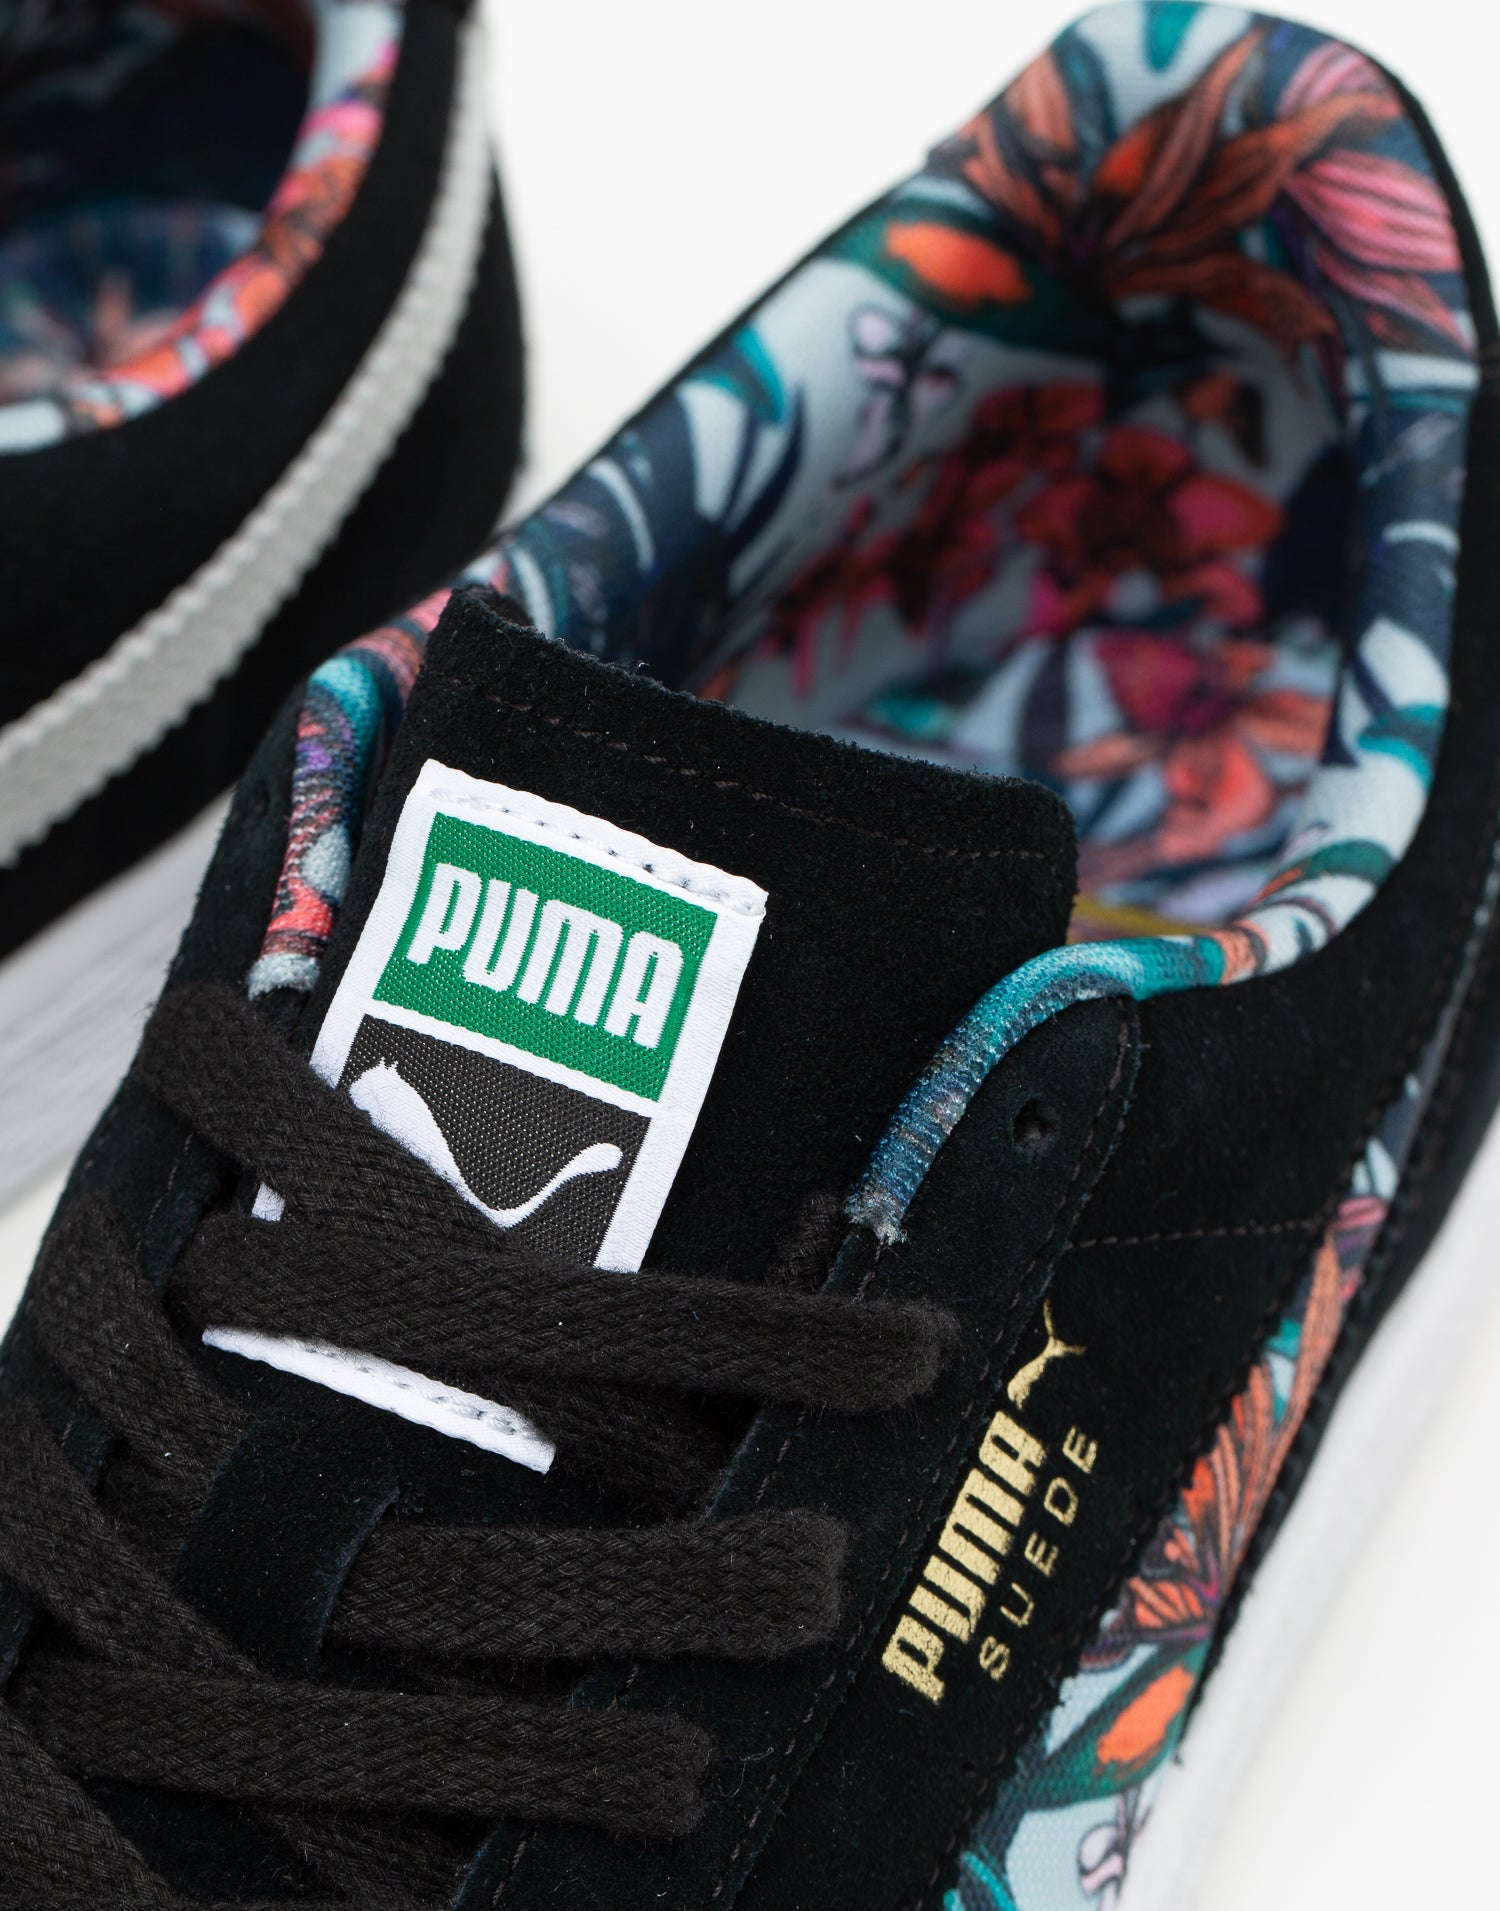 Puma adidas aeroburner alloy sale | Suede Secret Garden BlackWhite